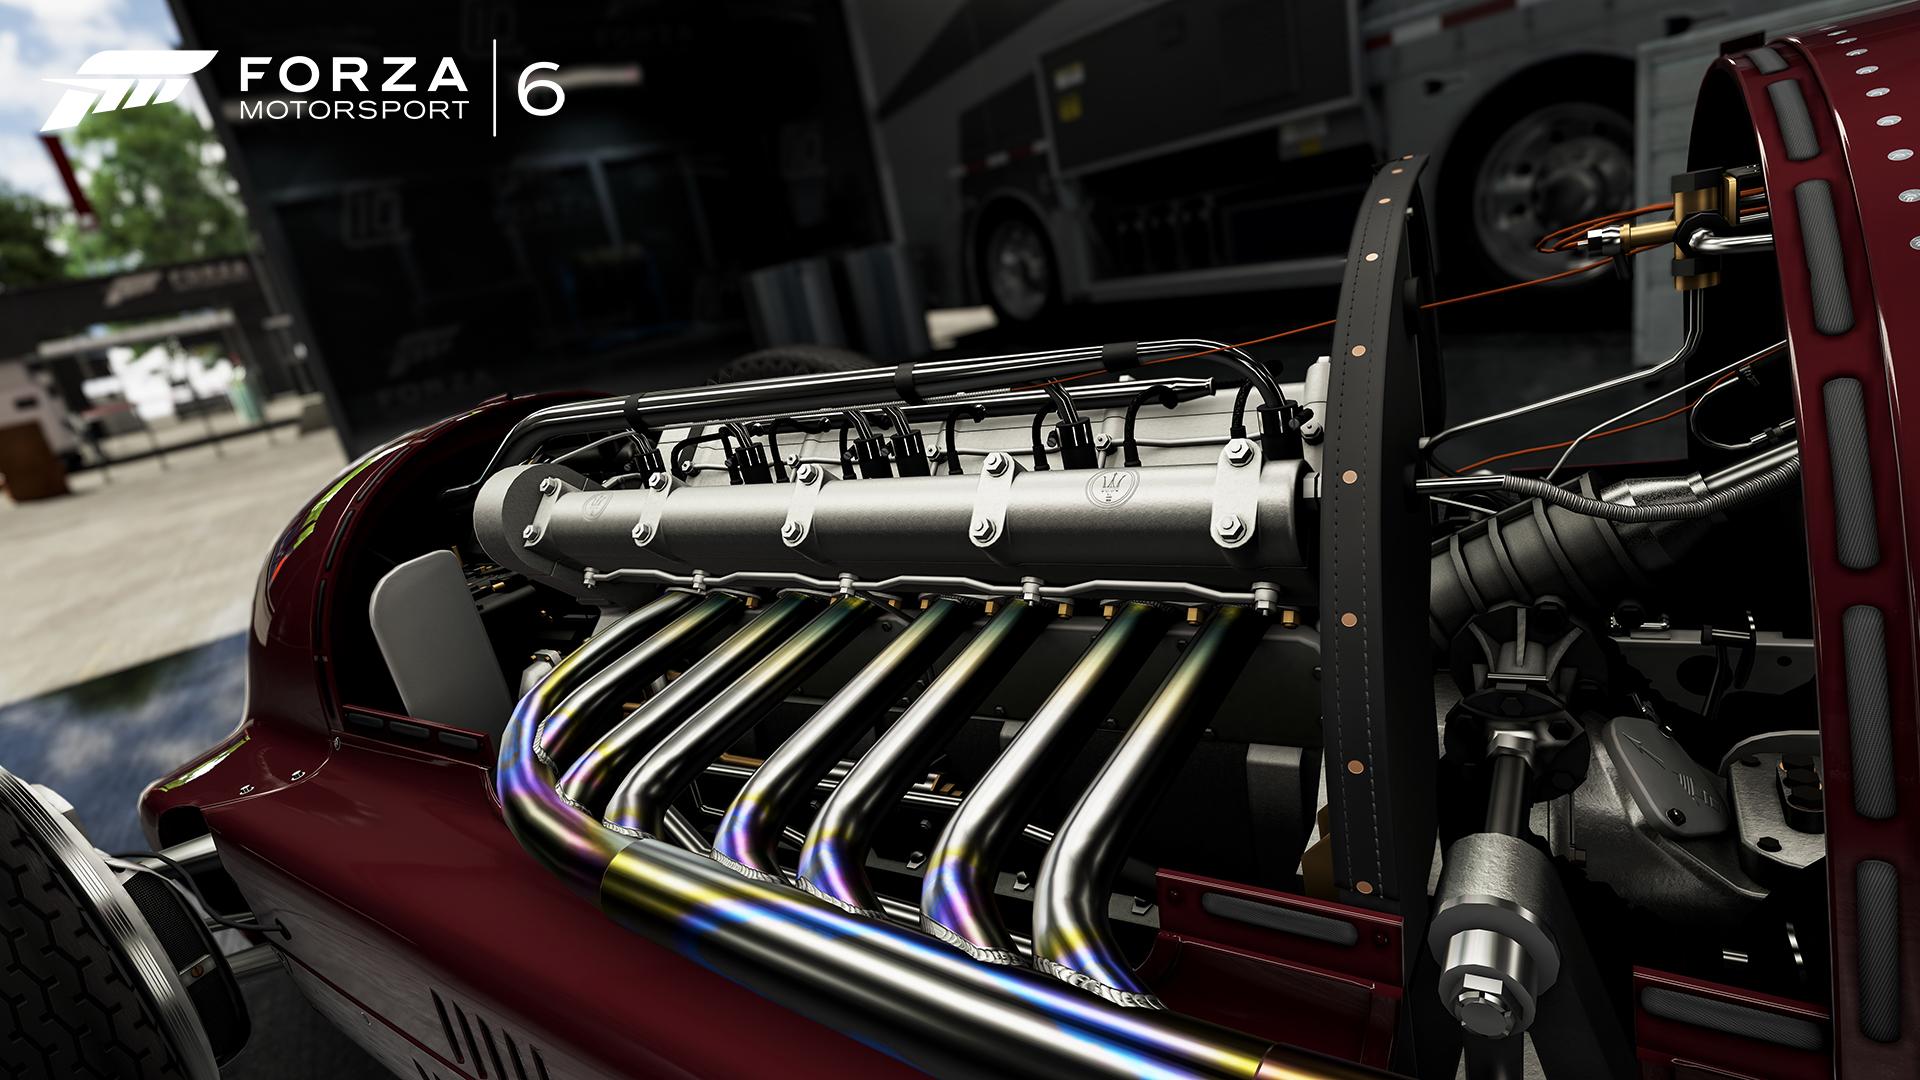 Forza Motorsport 6 - Maserati classic car